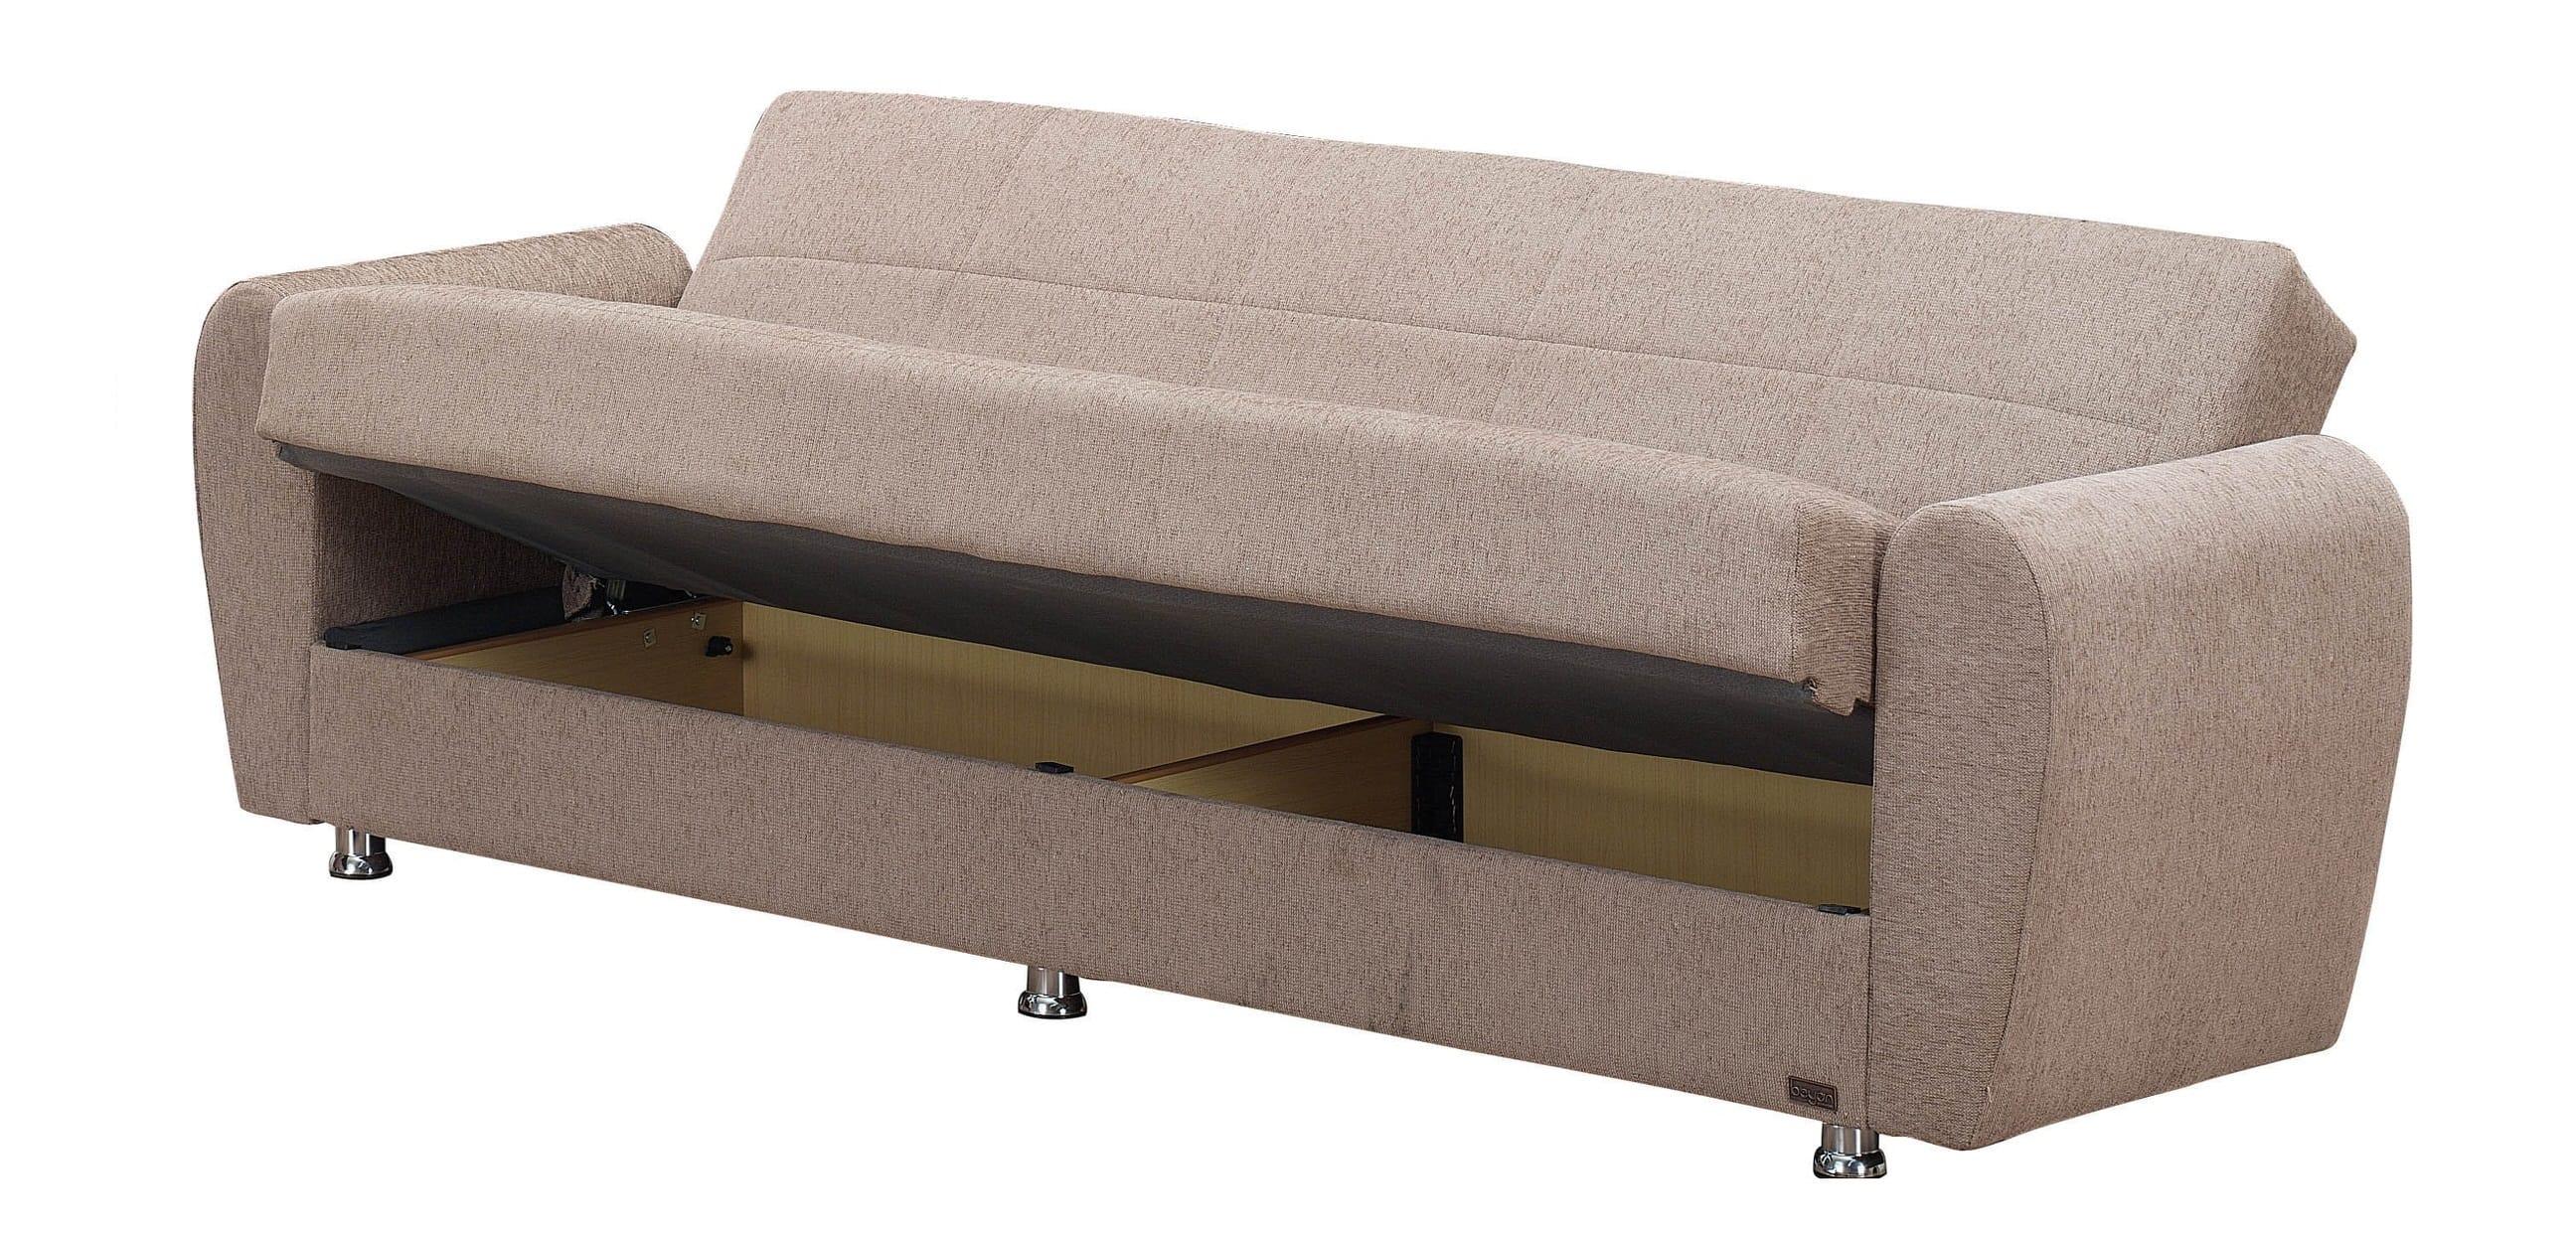 Sofa bed usa firenze modern sofa bed queen size mattress for Sofa bed usa